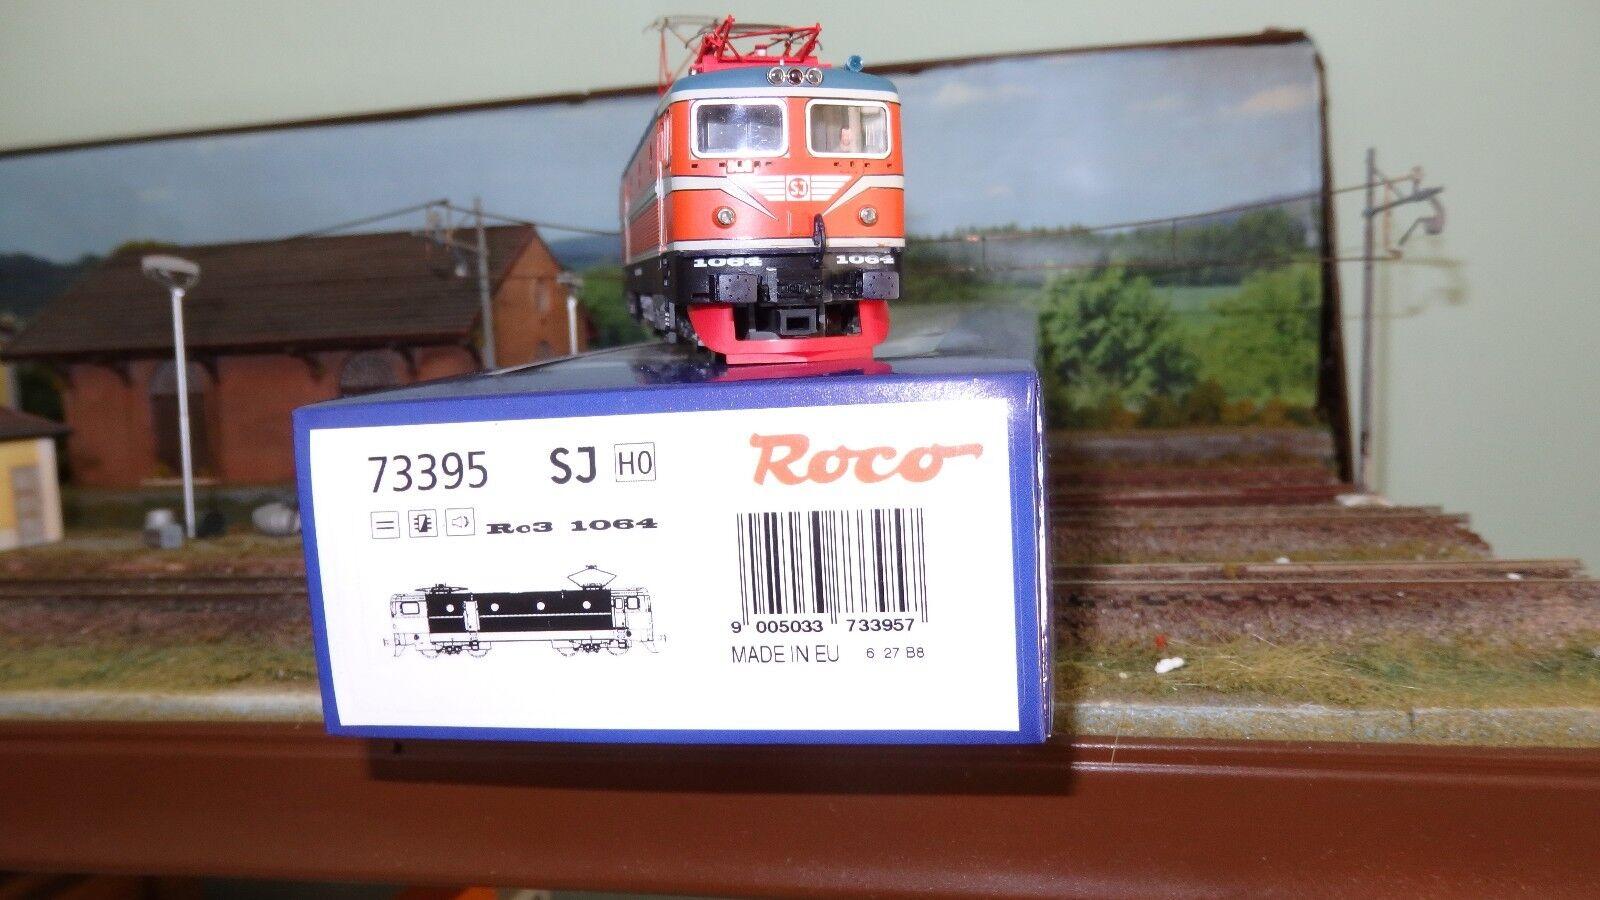 ROCO 73395 Rc3 1064 Rc3 SJ livrea di di di origine arancio fasce bianche, DCC Sound 24ec6f